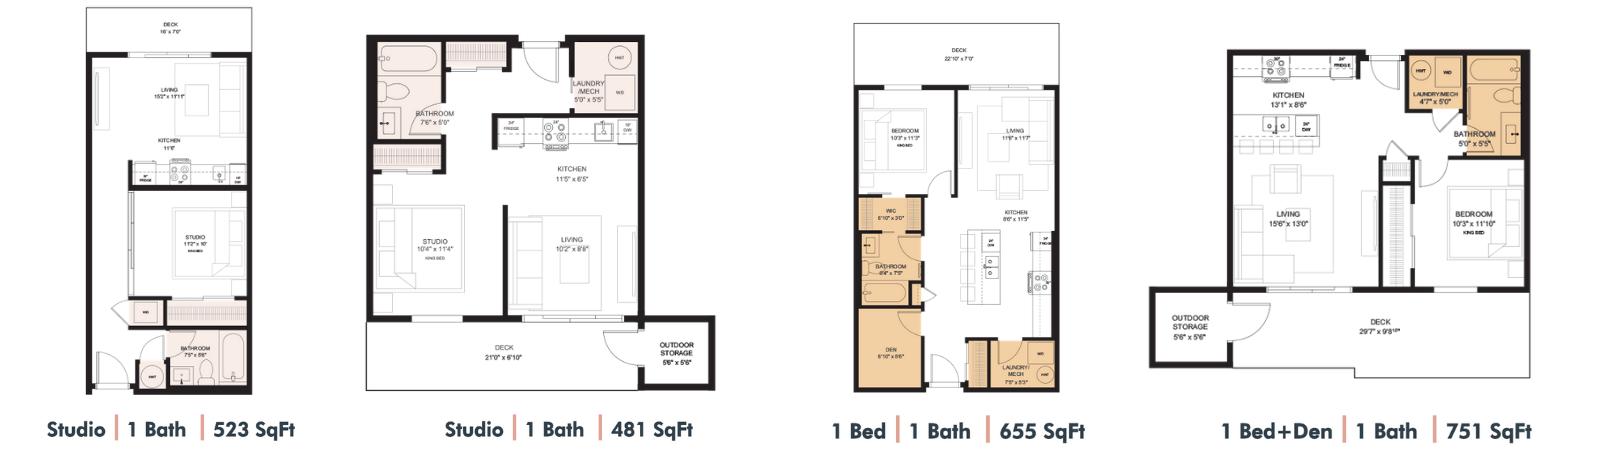 Cawston Floor Plans